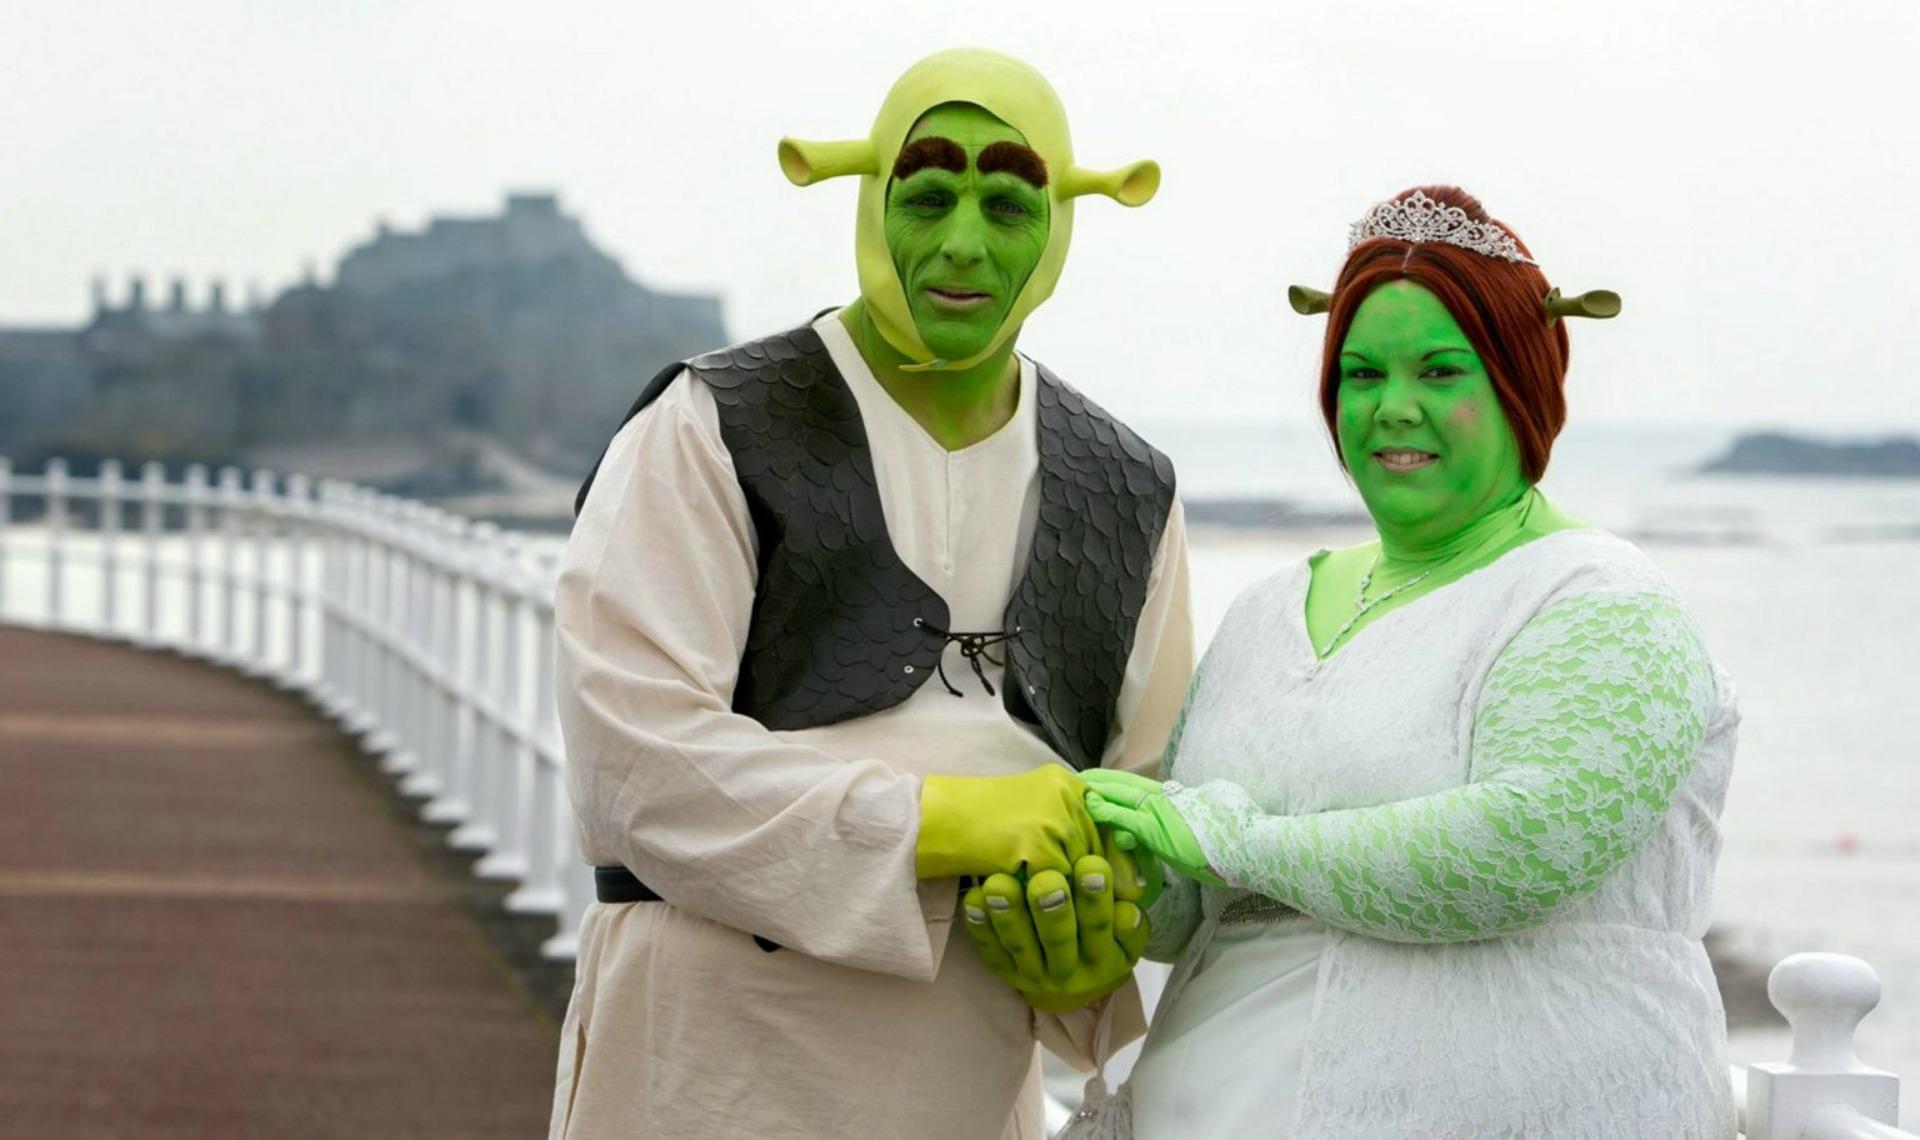 idée mariage insolite animation mariage insolite idée mariage insolite